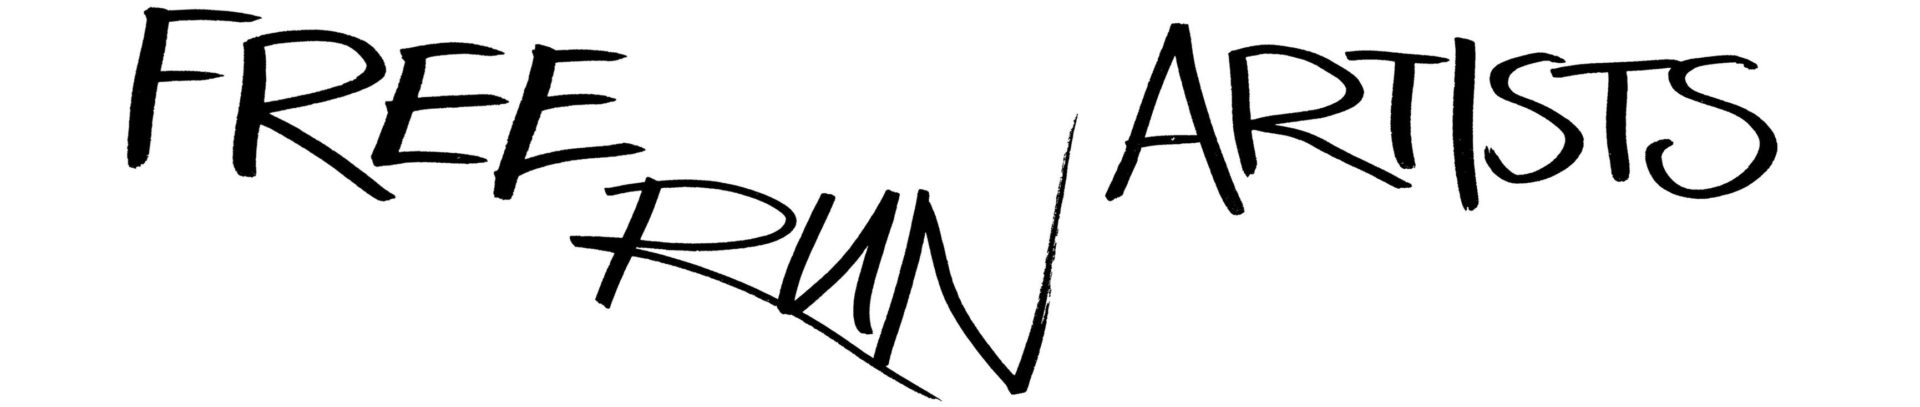 Free Run Artists